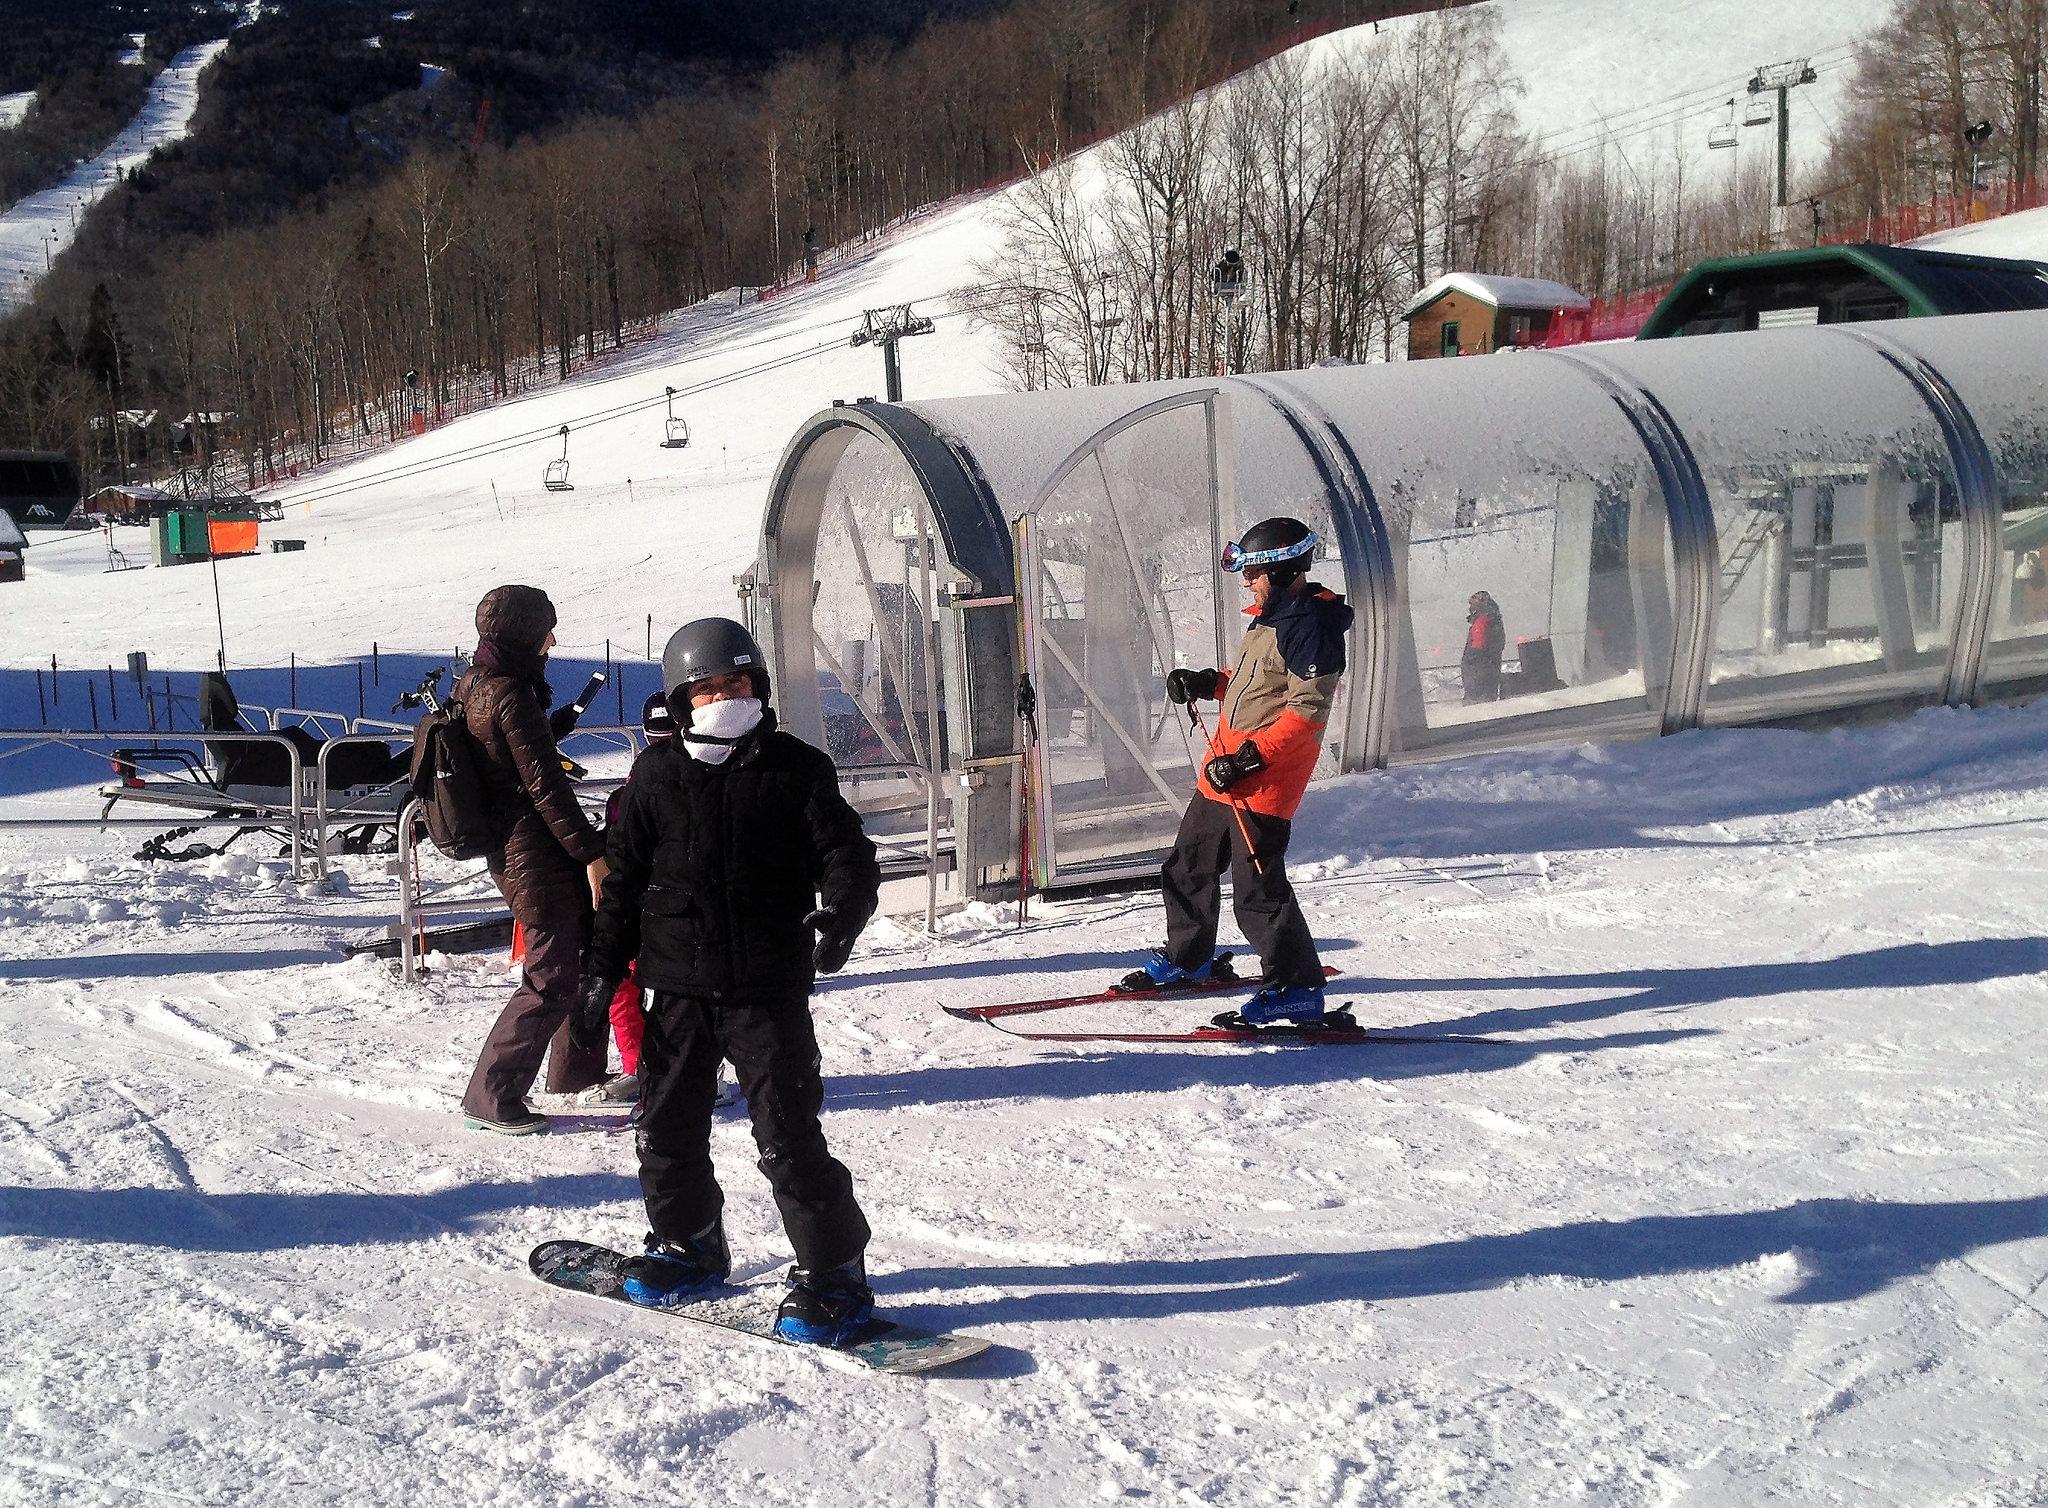 beginner ski lift - stowe mountain resort